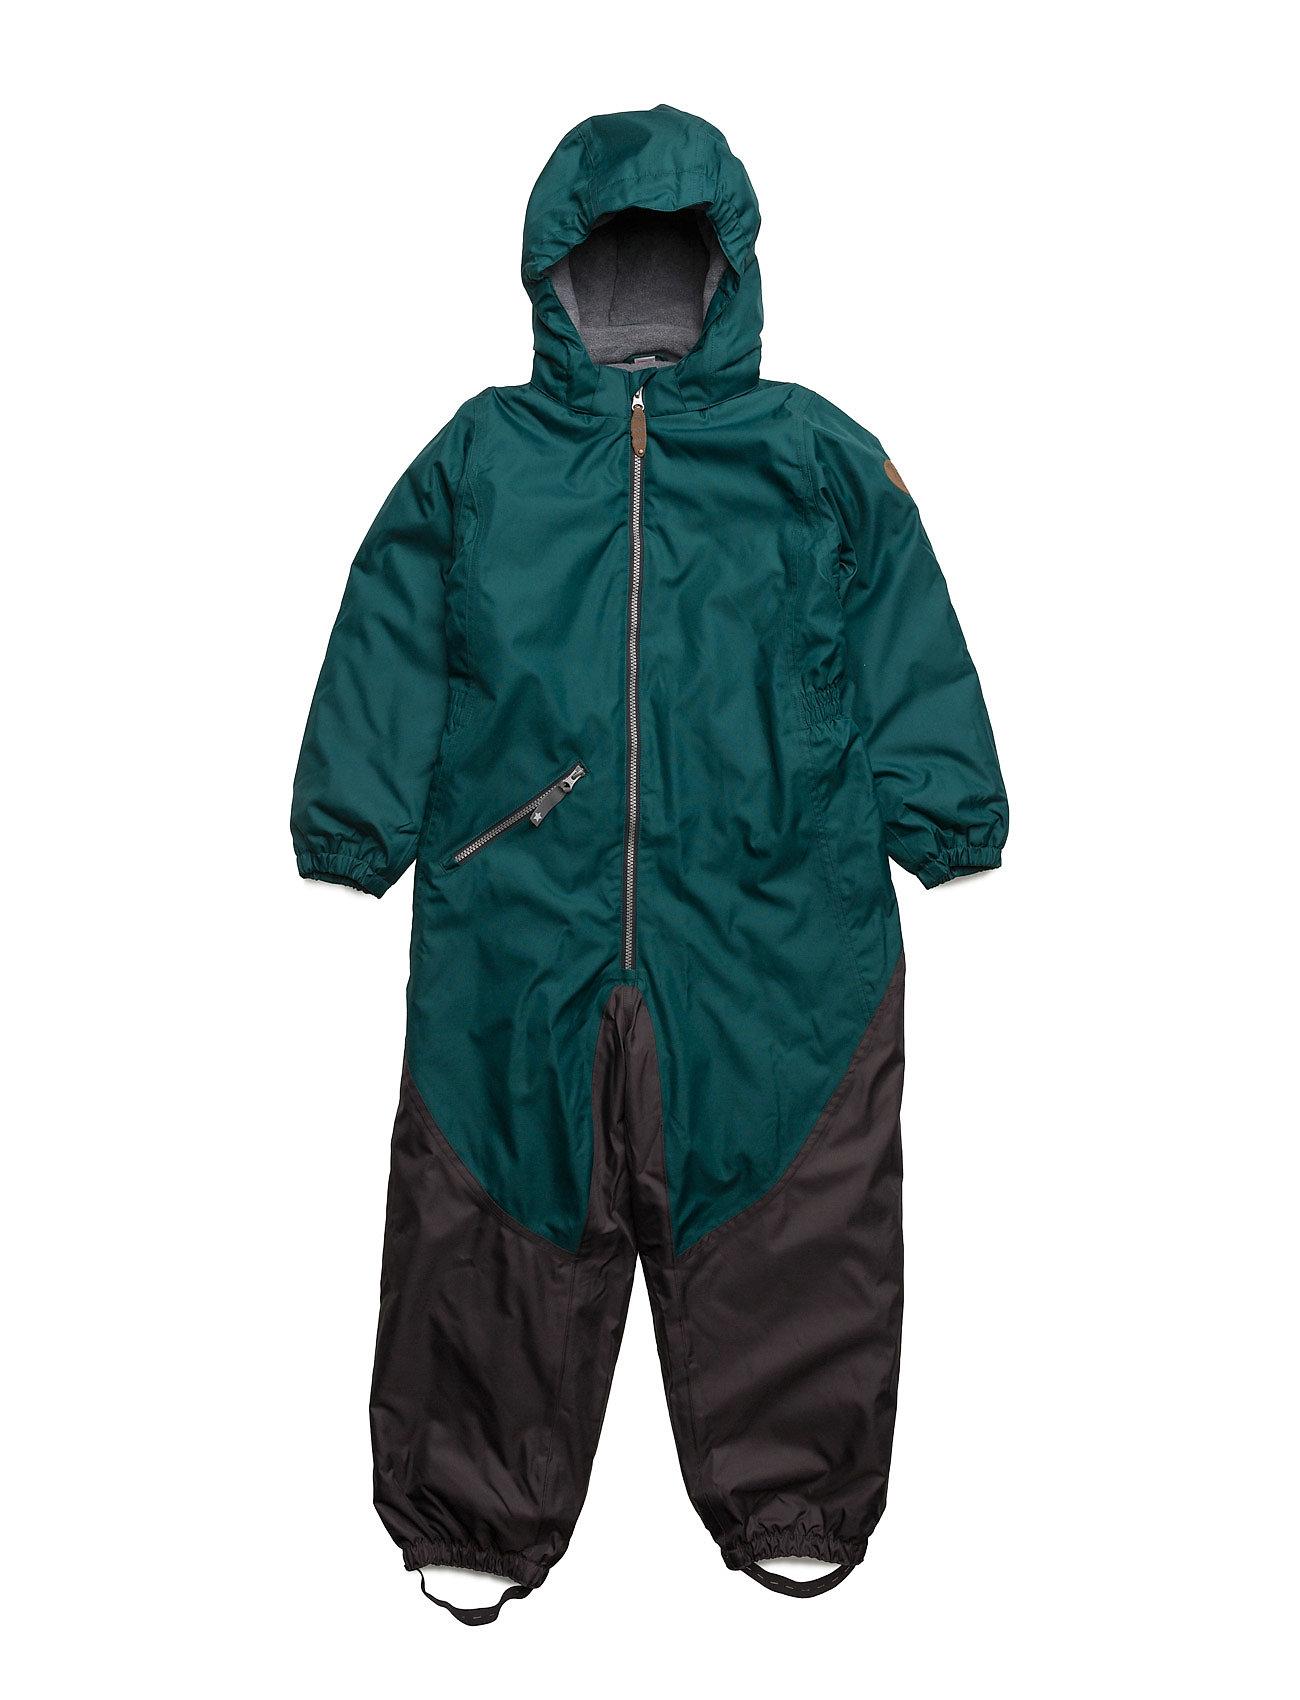 racoon outdoor – Anker solid suit fra boozt.com dk